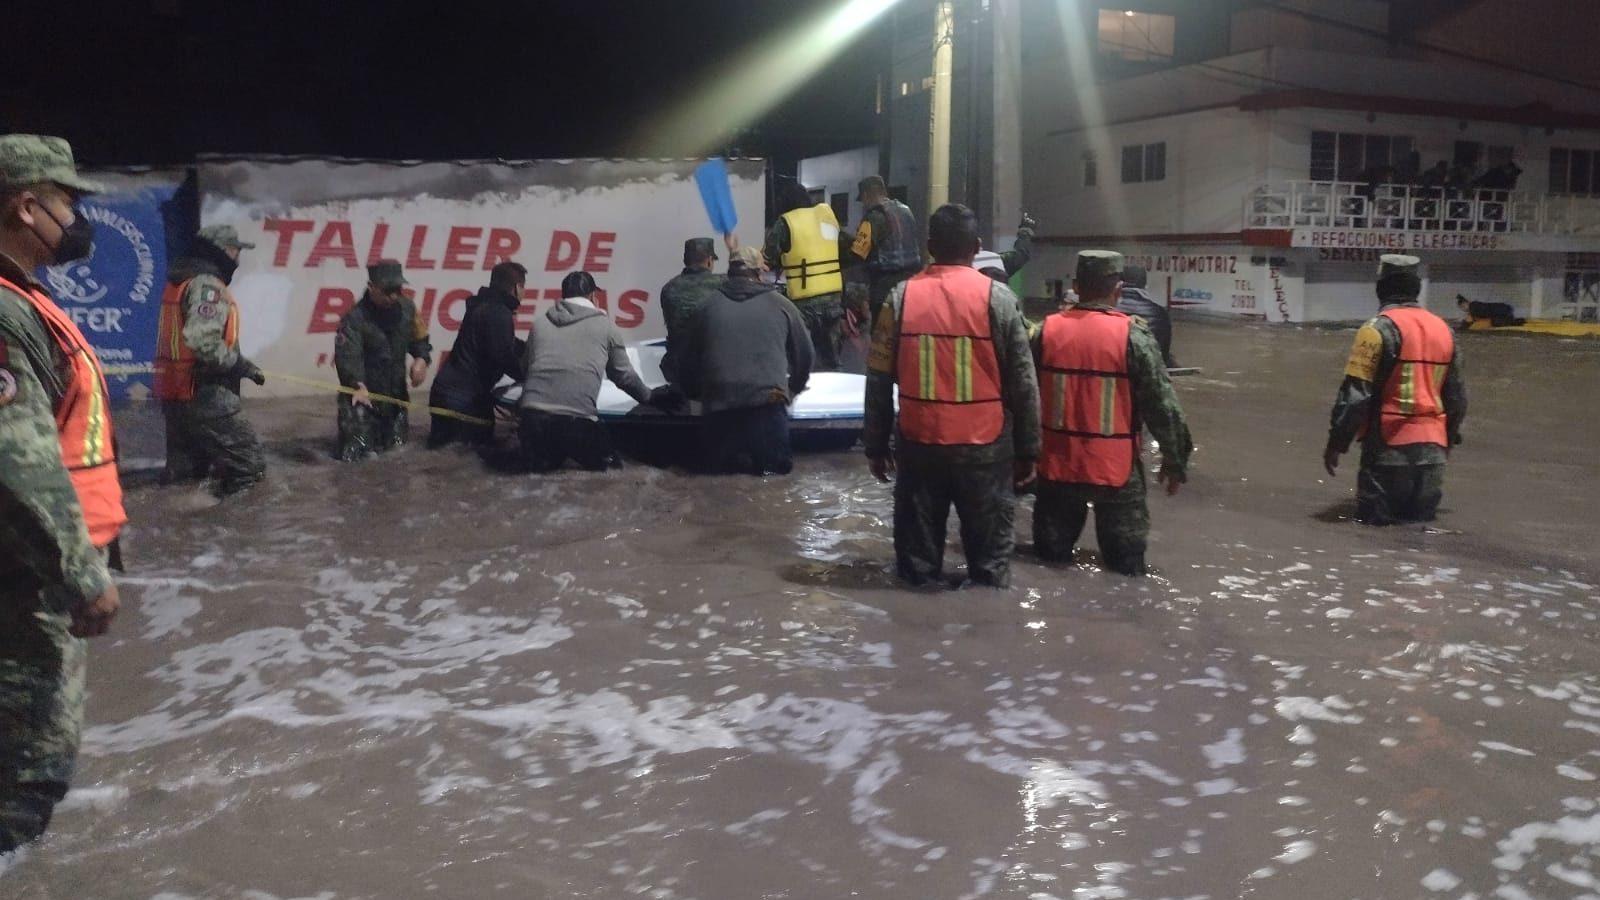 Lluvias detonan falla en hospital de Hidalgo; mueren 10 pacientes